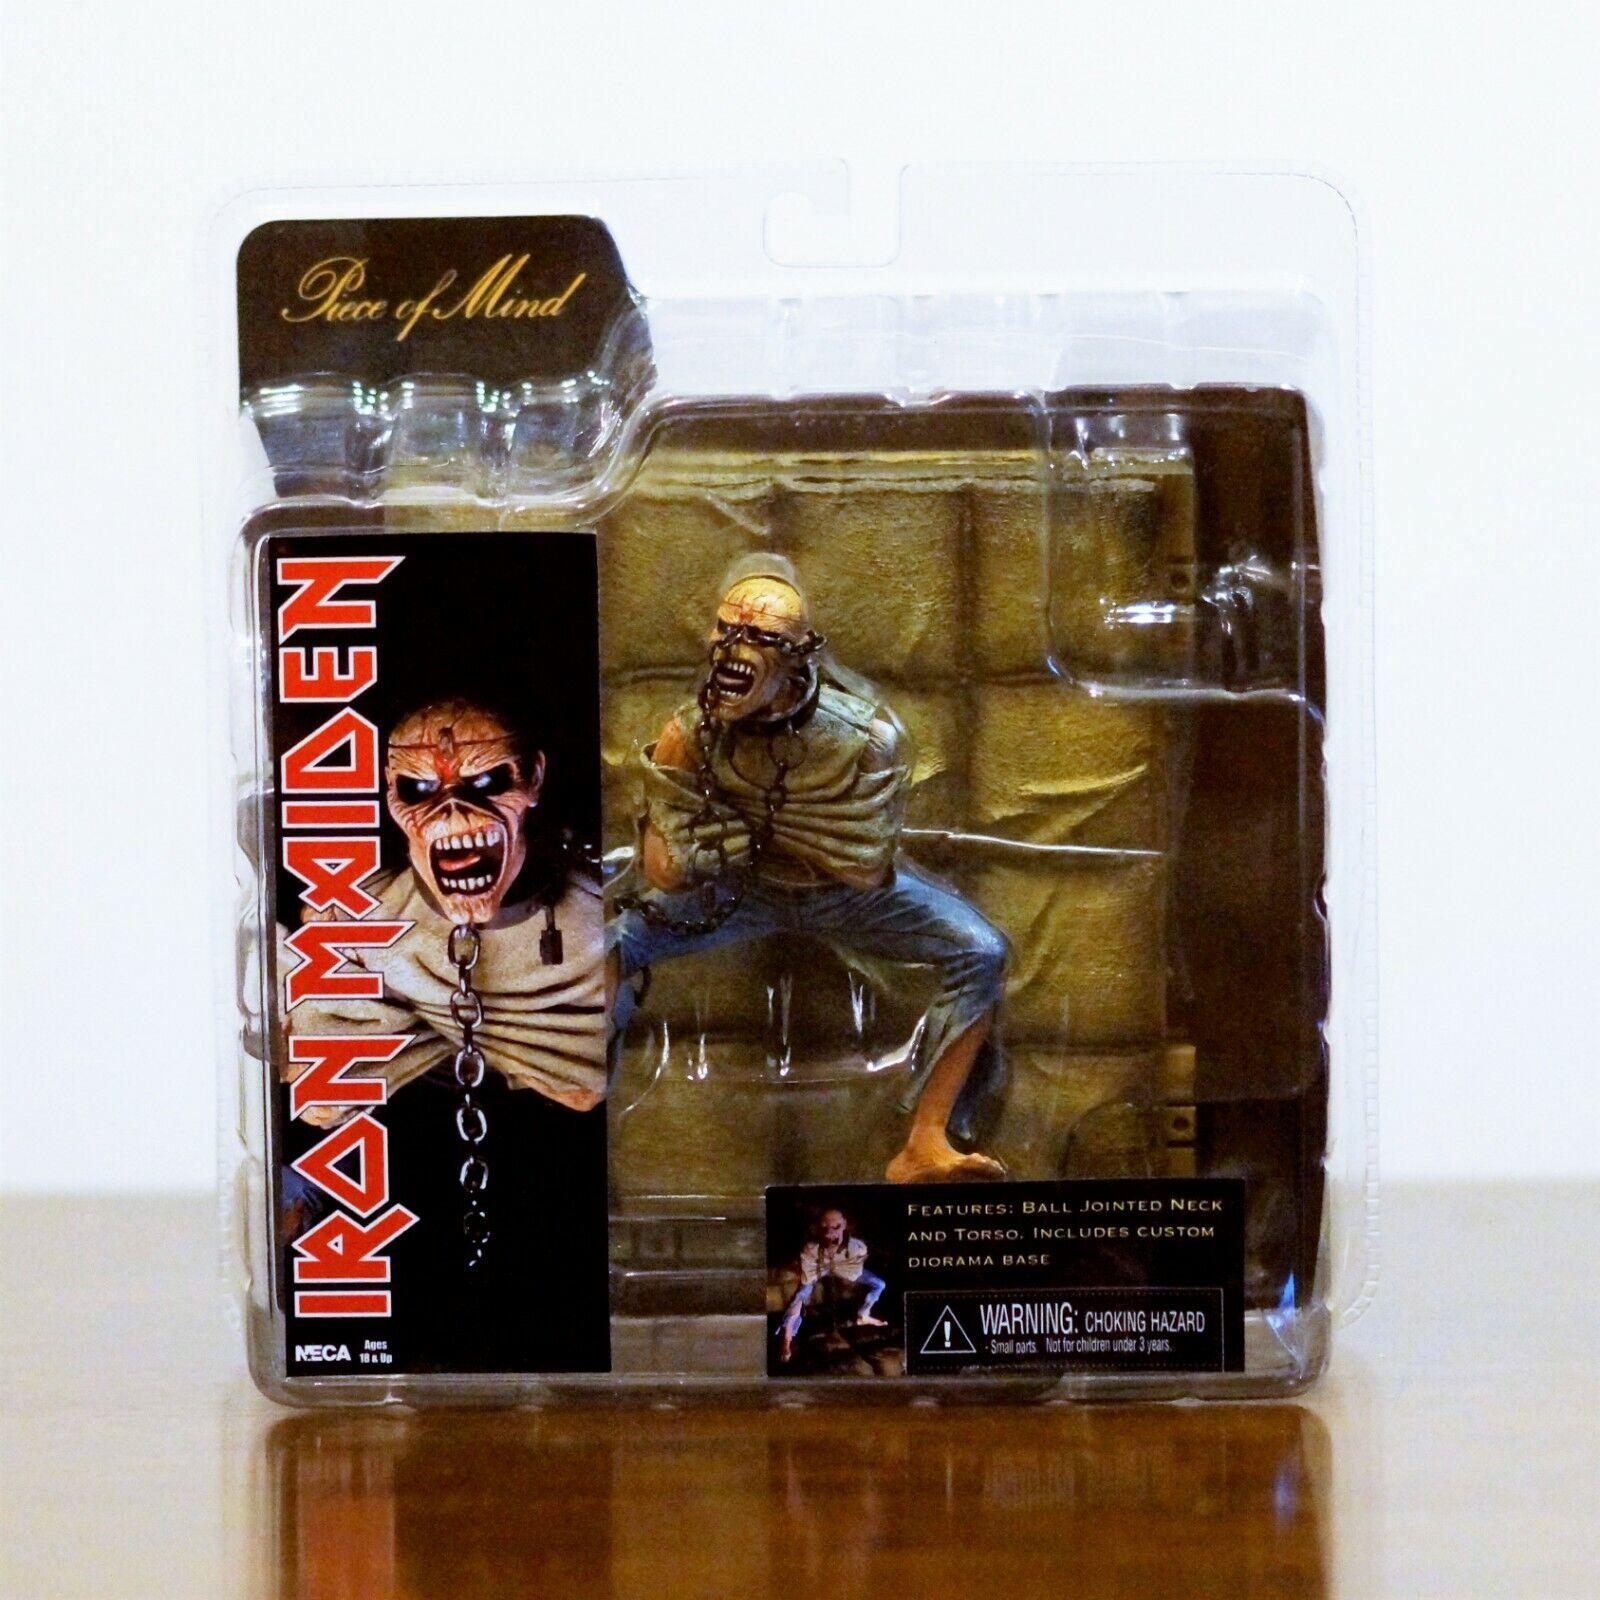 Iron Maiden EDDIE - Piece of Mind - 7   cifra  w  Diorama by NECA - 2010  più economico